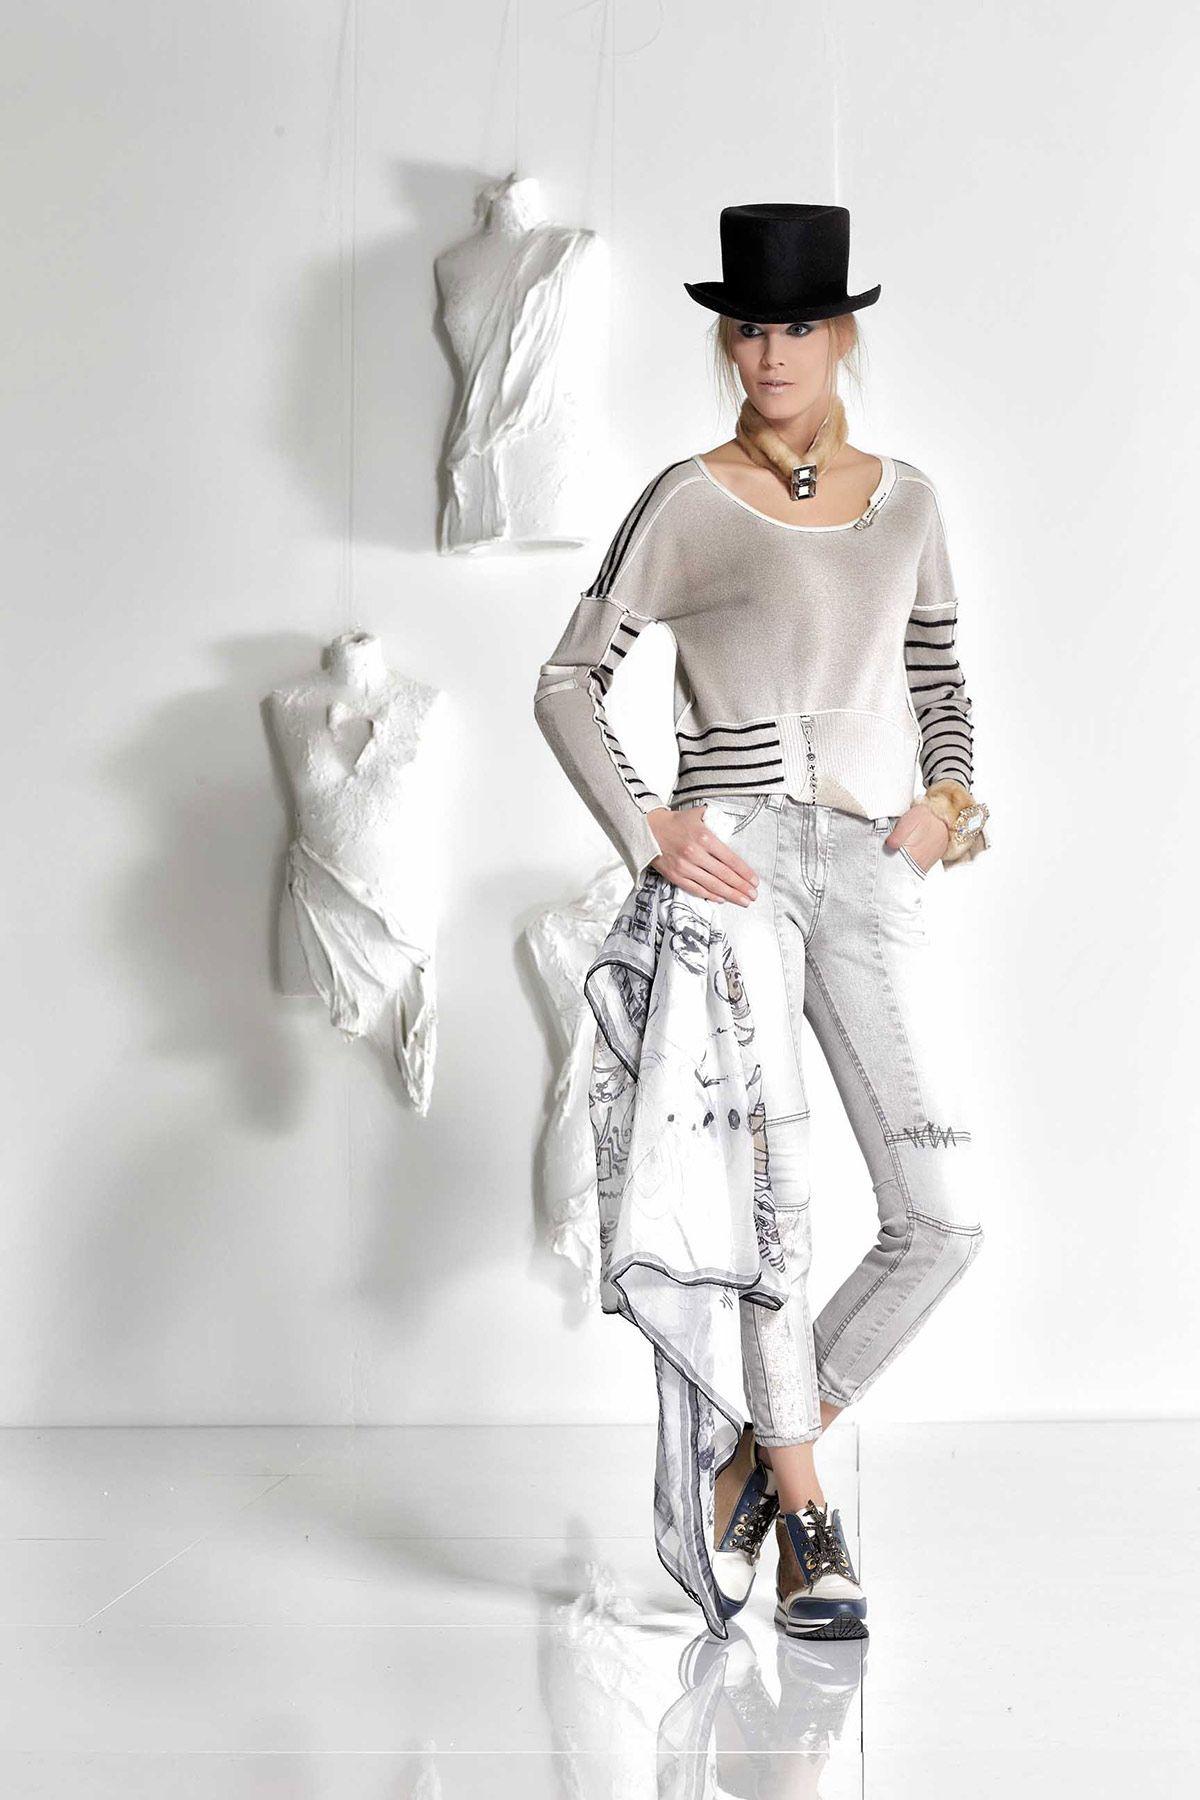 DANIELA DALLAVALLE - #danieladallavalle #collection #fw17 #elisacavaletti #woman #chick #jeans #fashion #details #detailsmatter #tennis #shirt #blackandwhite #scarf #hat #necklace #funfur